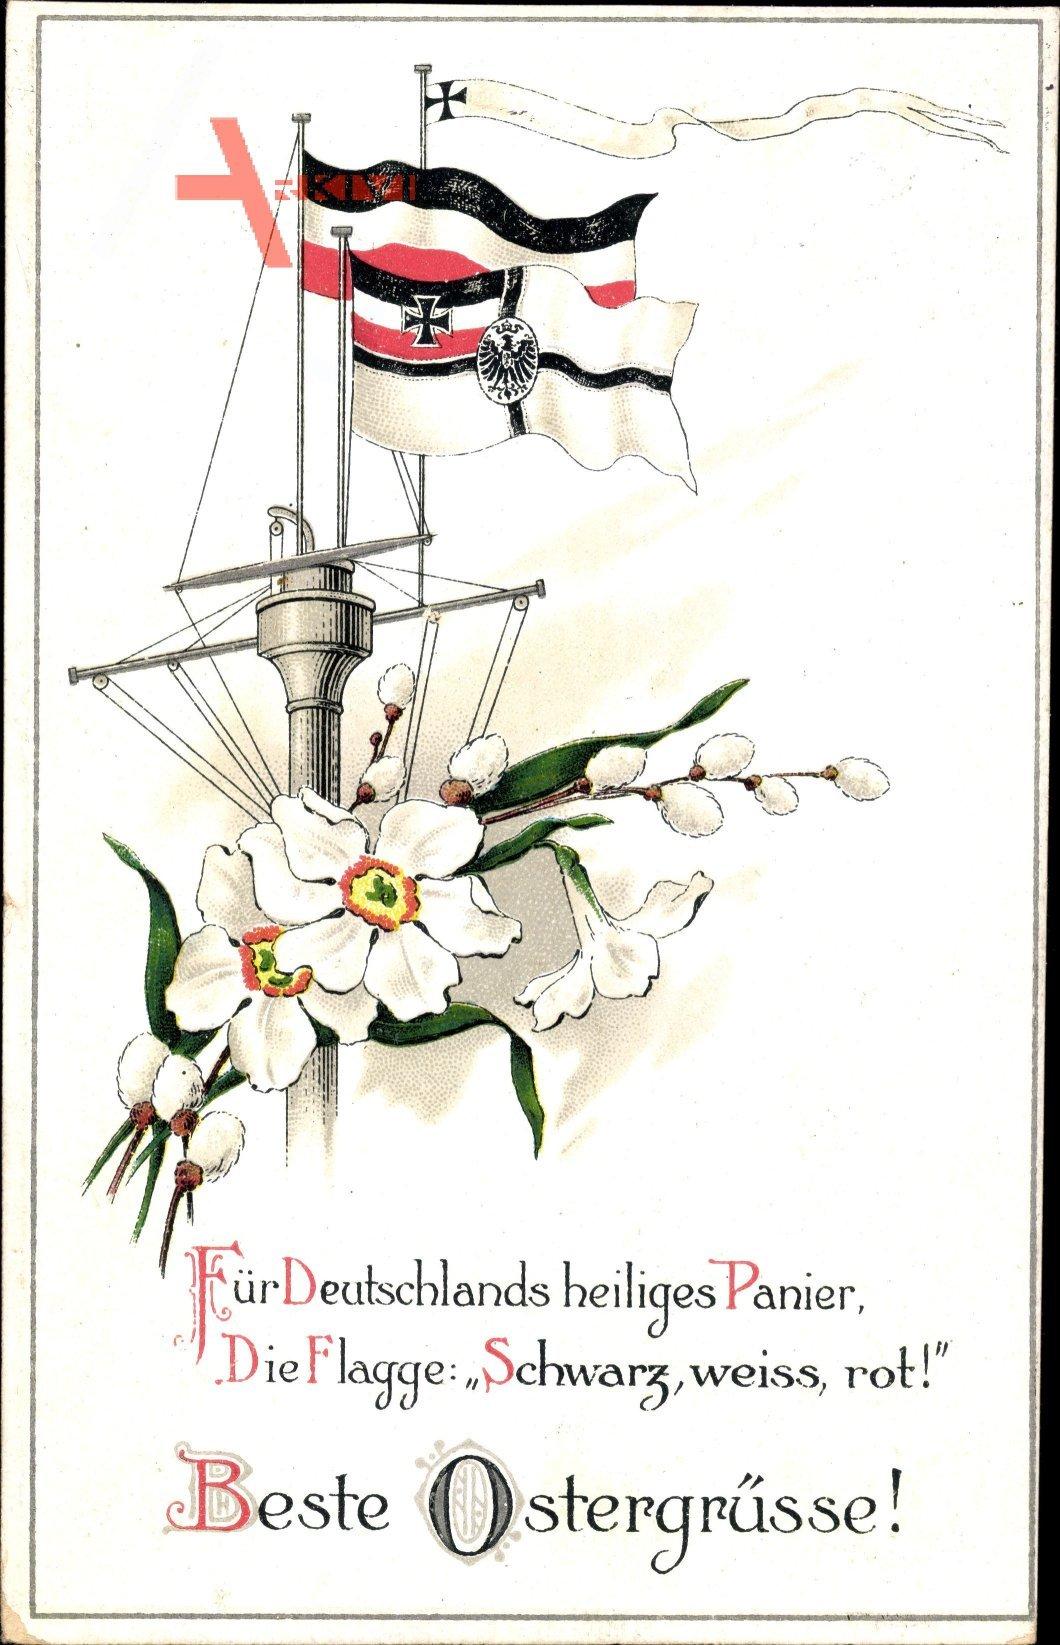 Glückwunsch Ostern, Fahnen, Schiffsmast, Weidenkätzchen